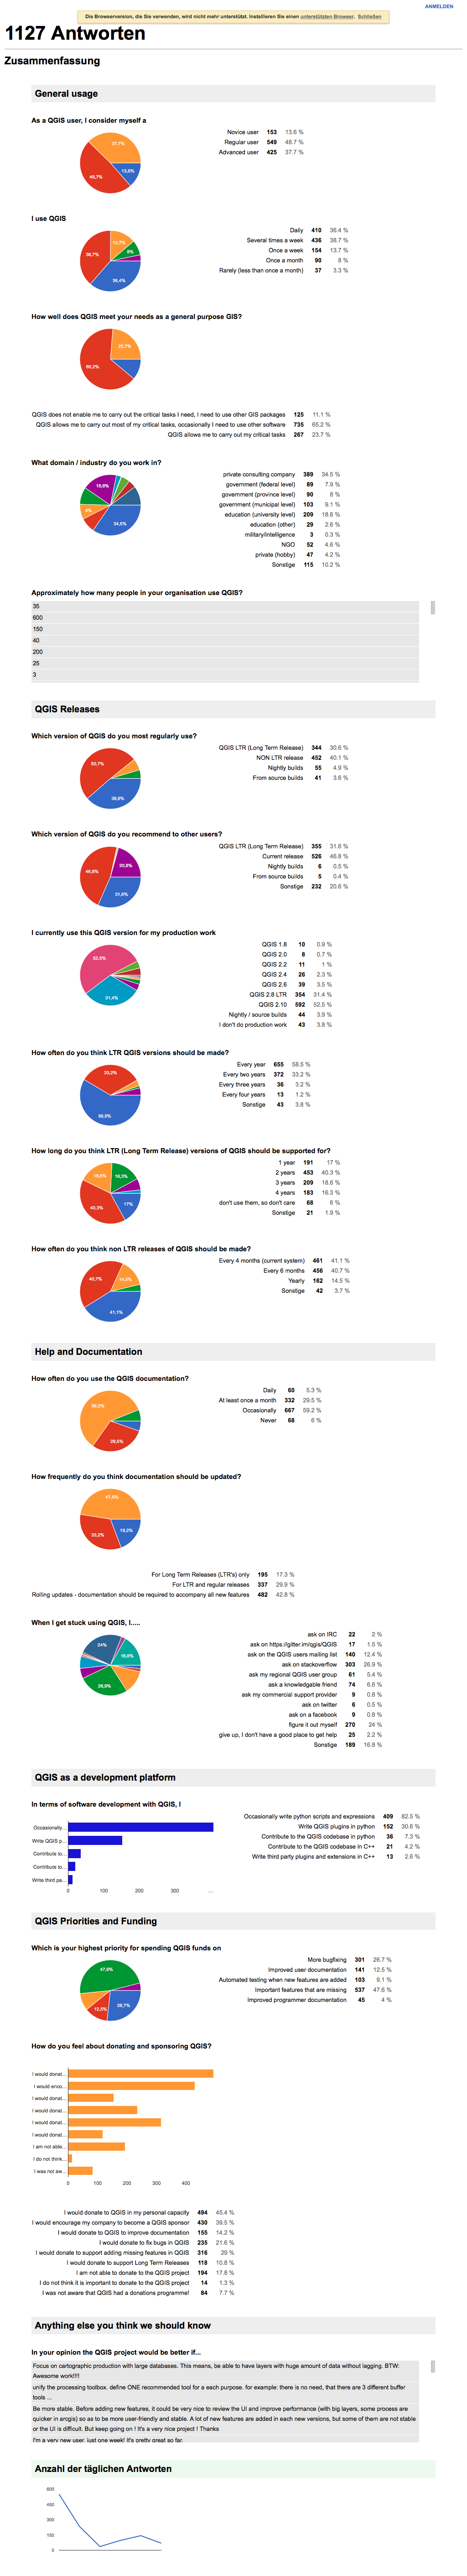 Current survey report.